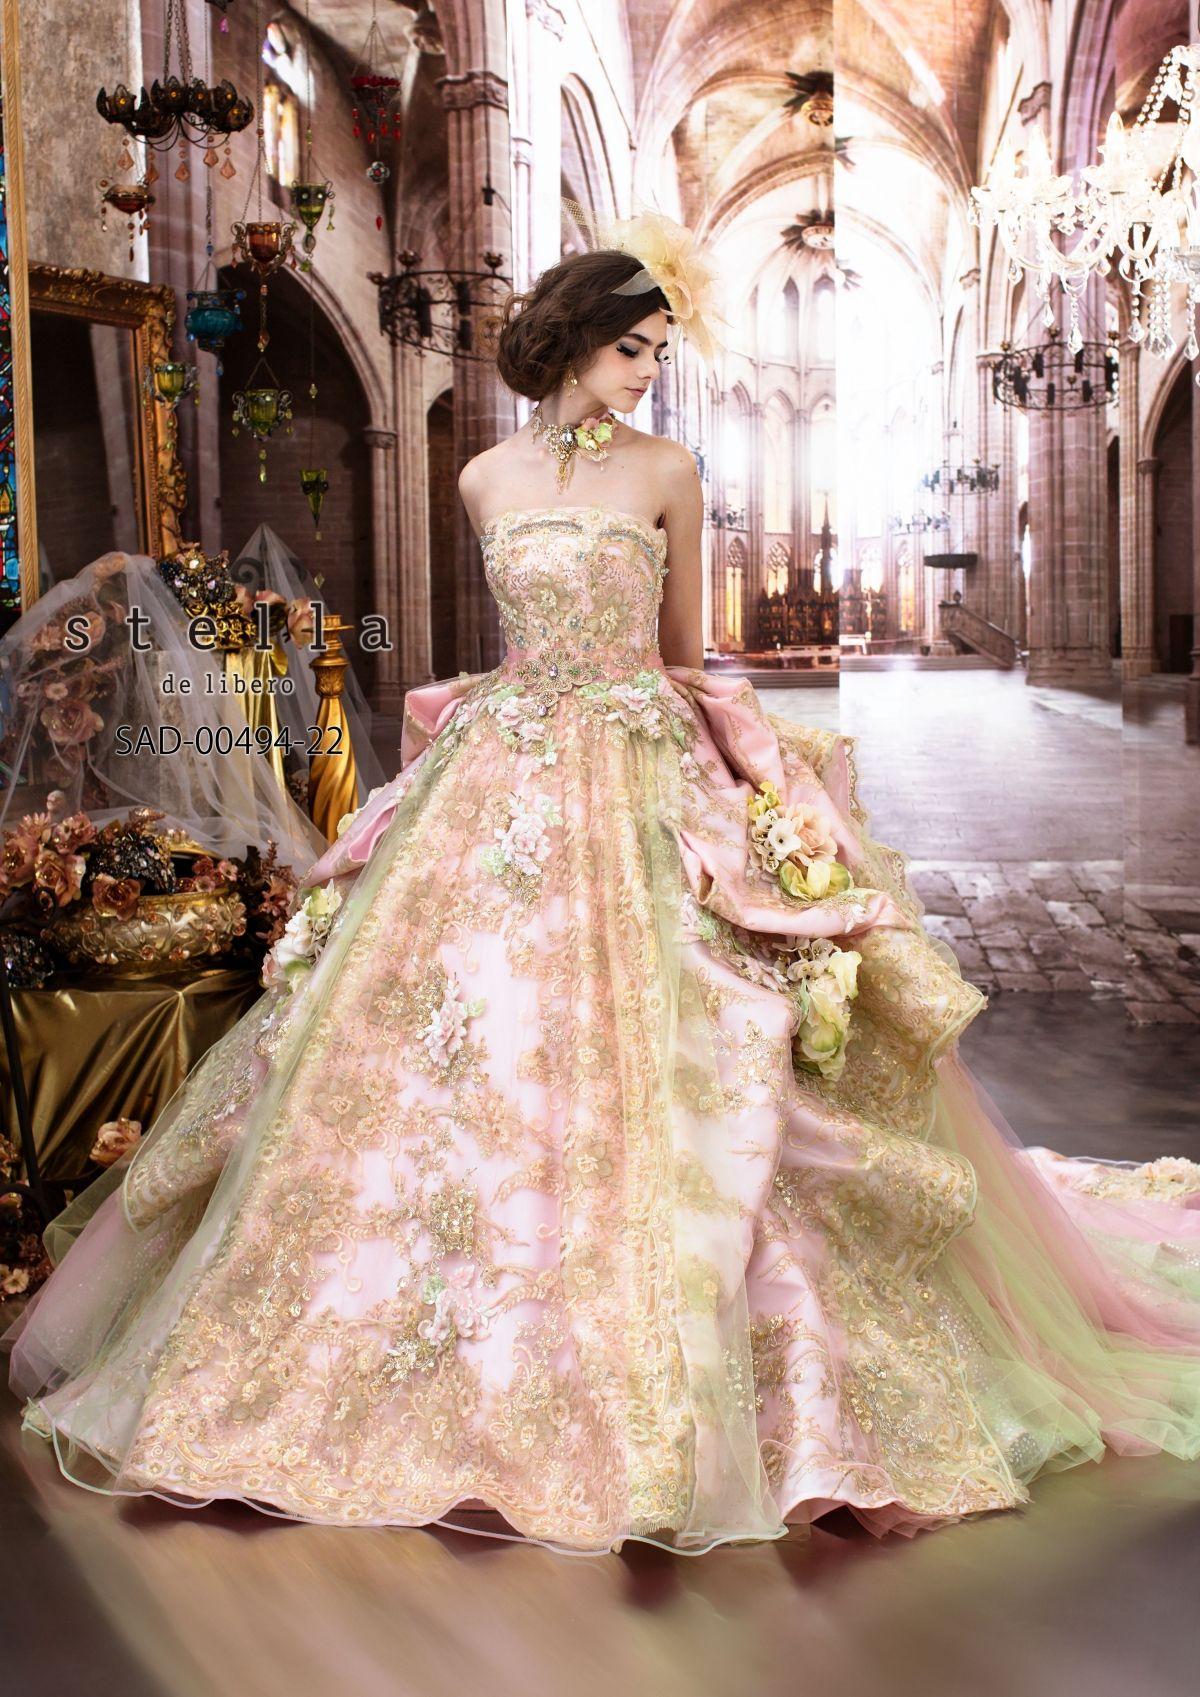 a105557f824 Stella de Libero Colorful Wedding dress